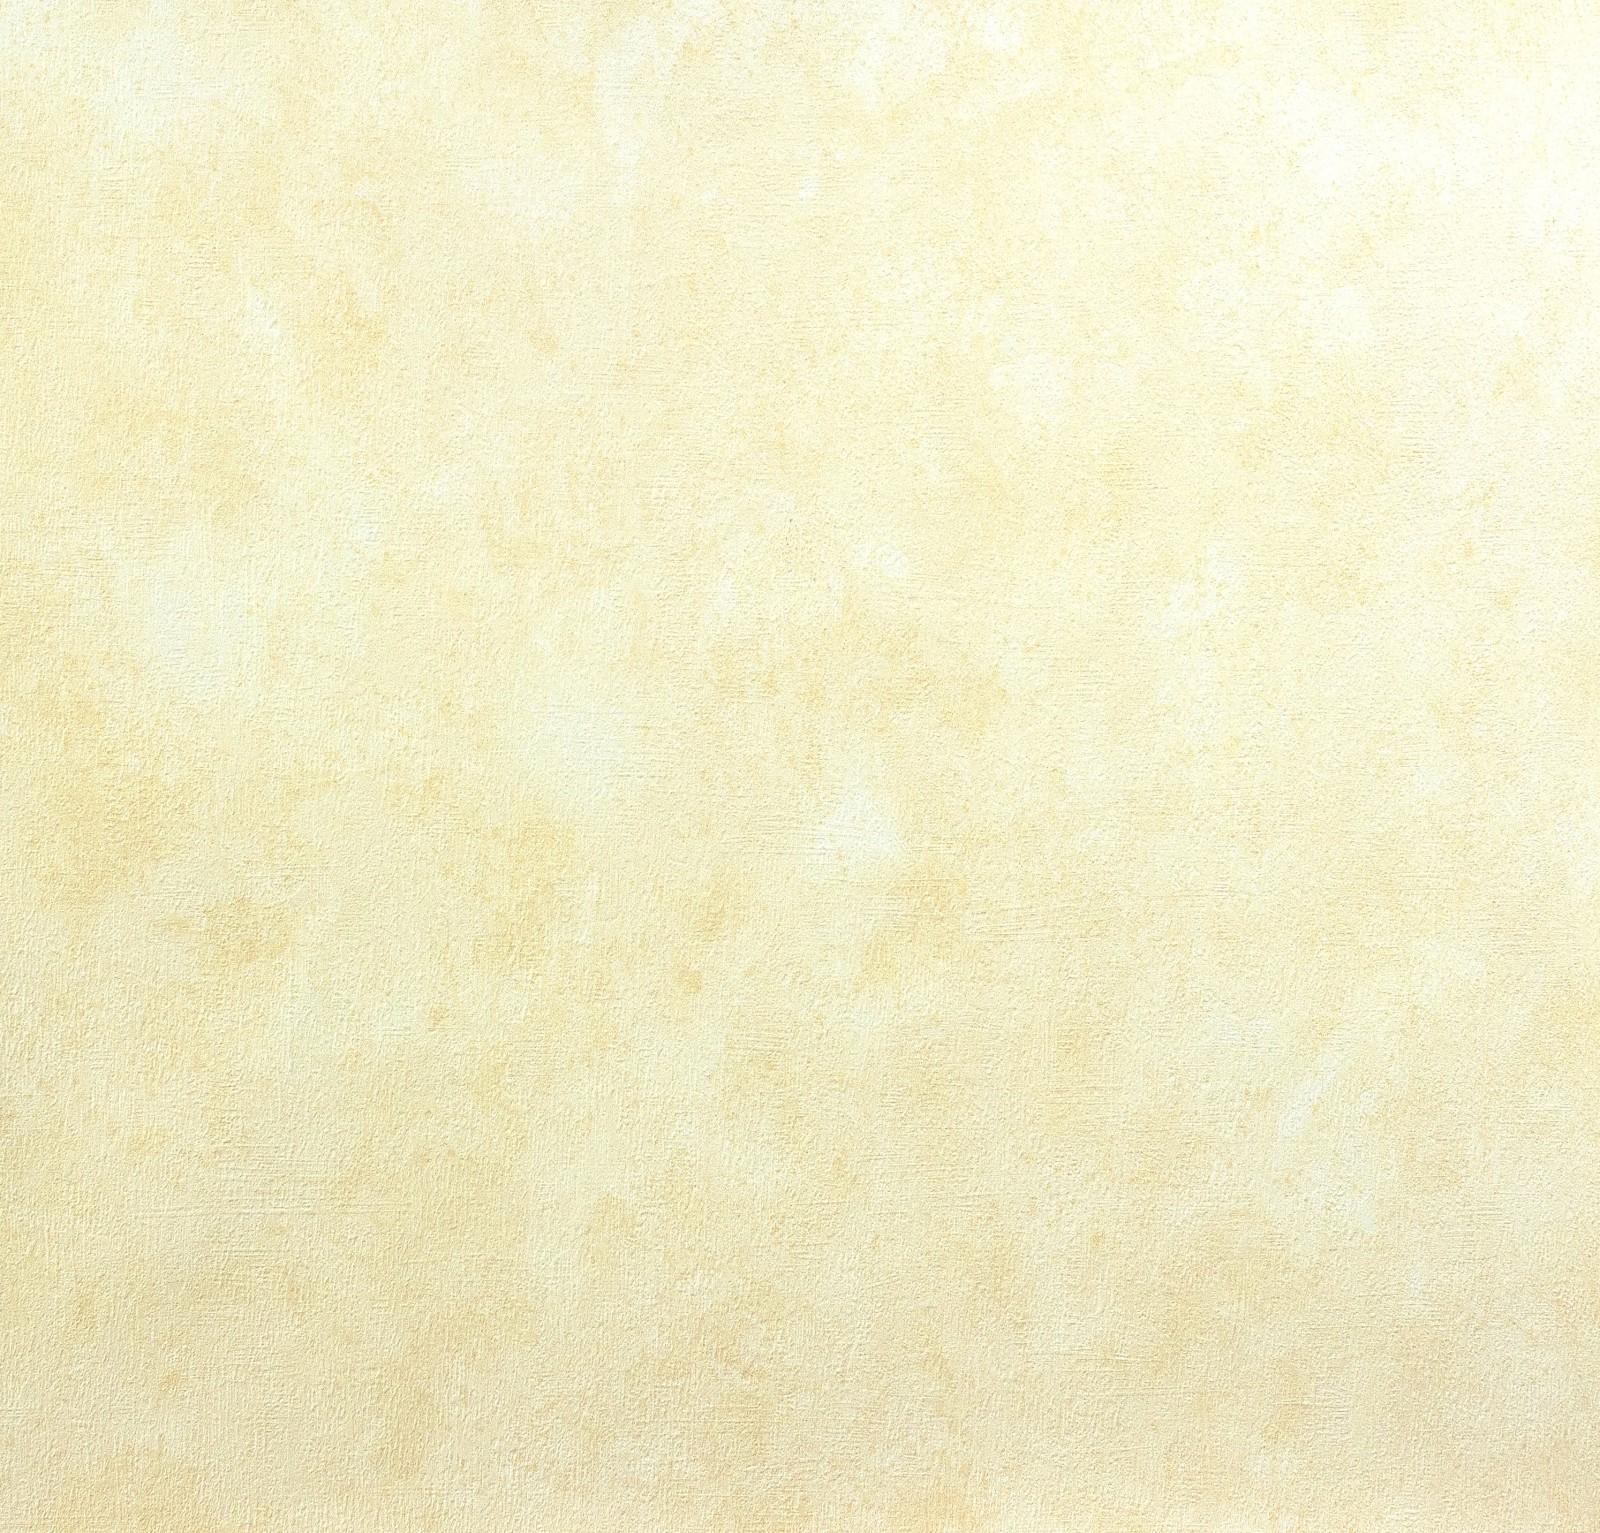 Kids Wallpaper Plain Structured Apricot 7584 15